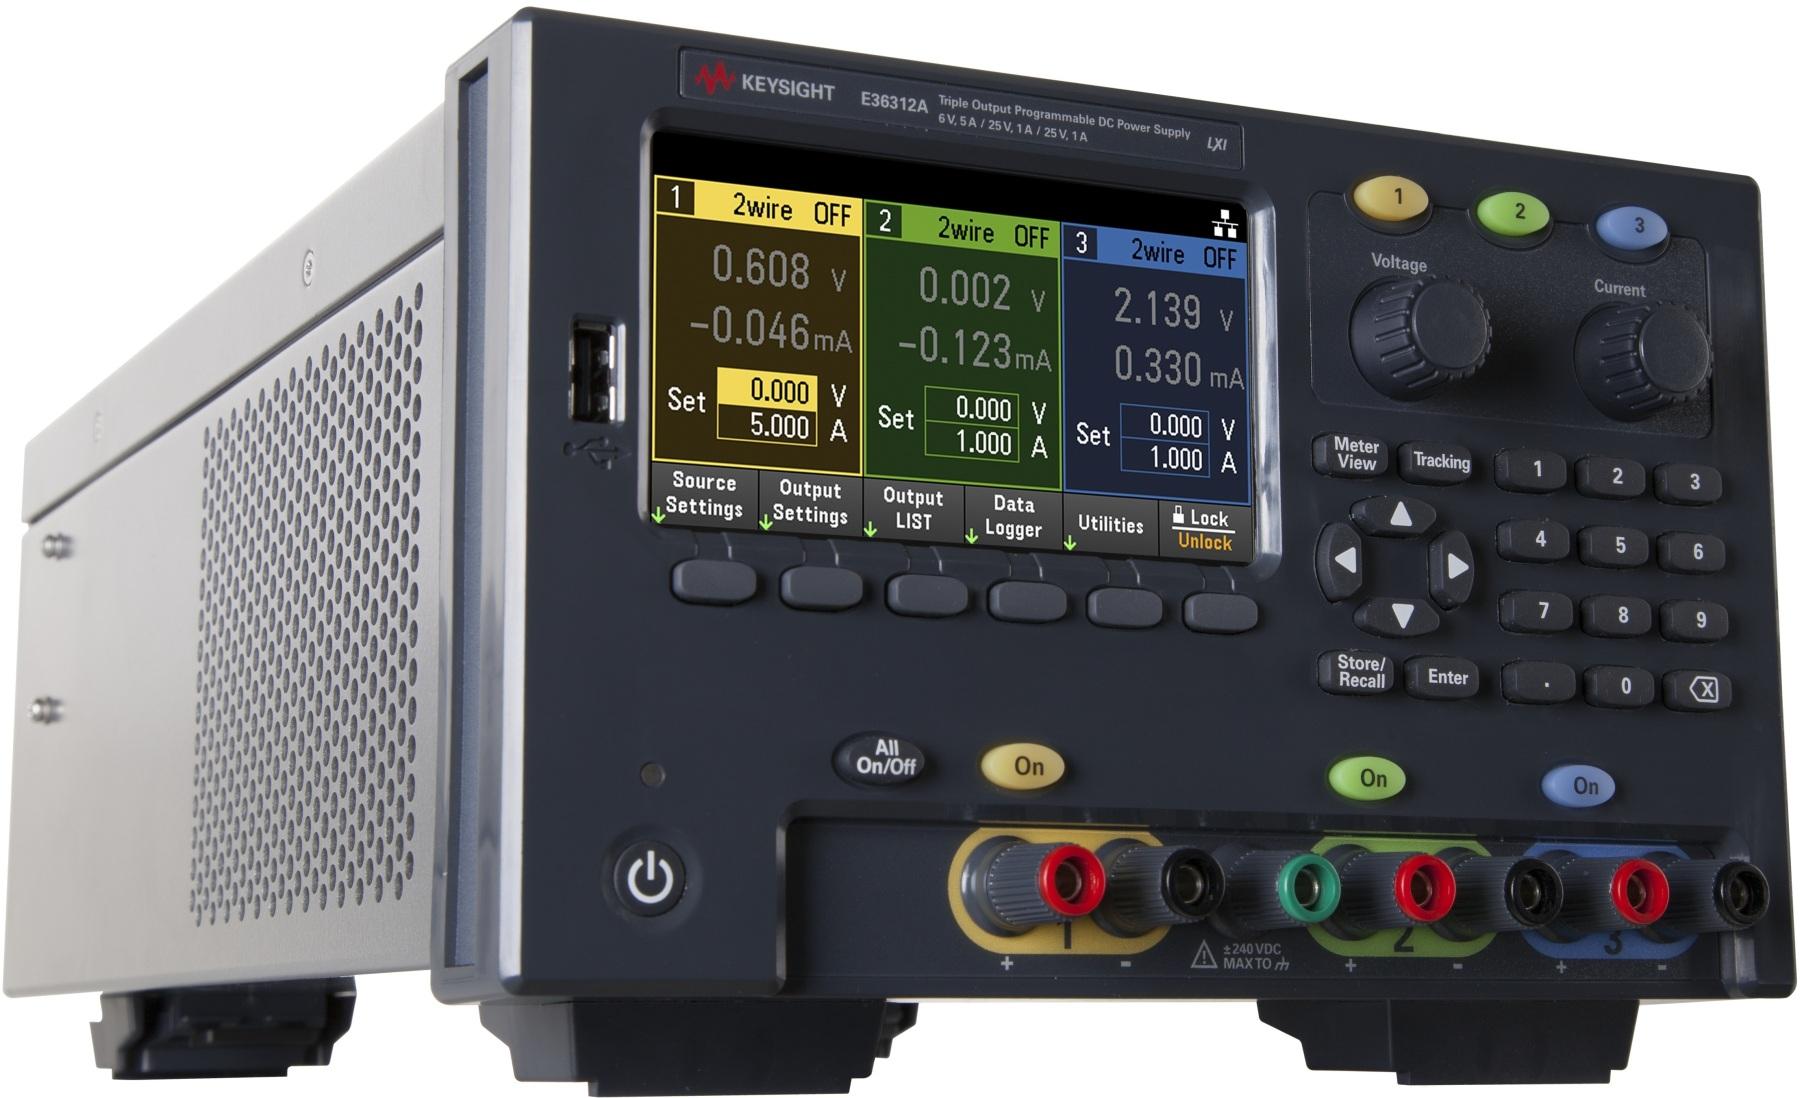 Keysight-E36300-series-triple-output-dc-power-supplies_1800x1098_1497650062